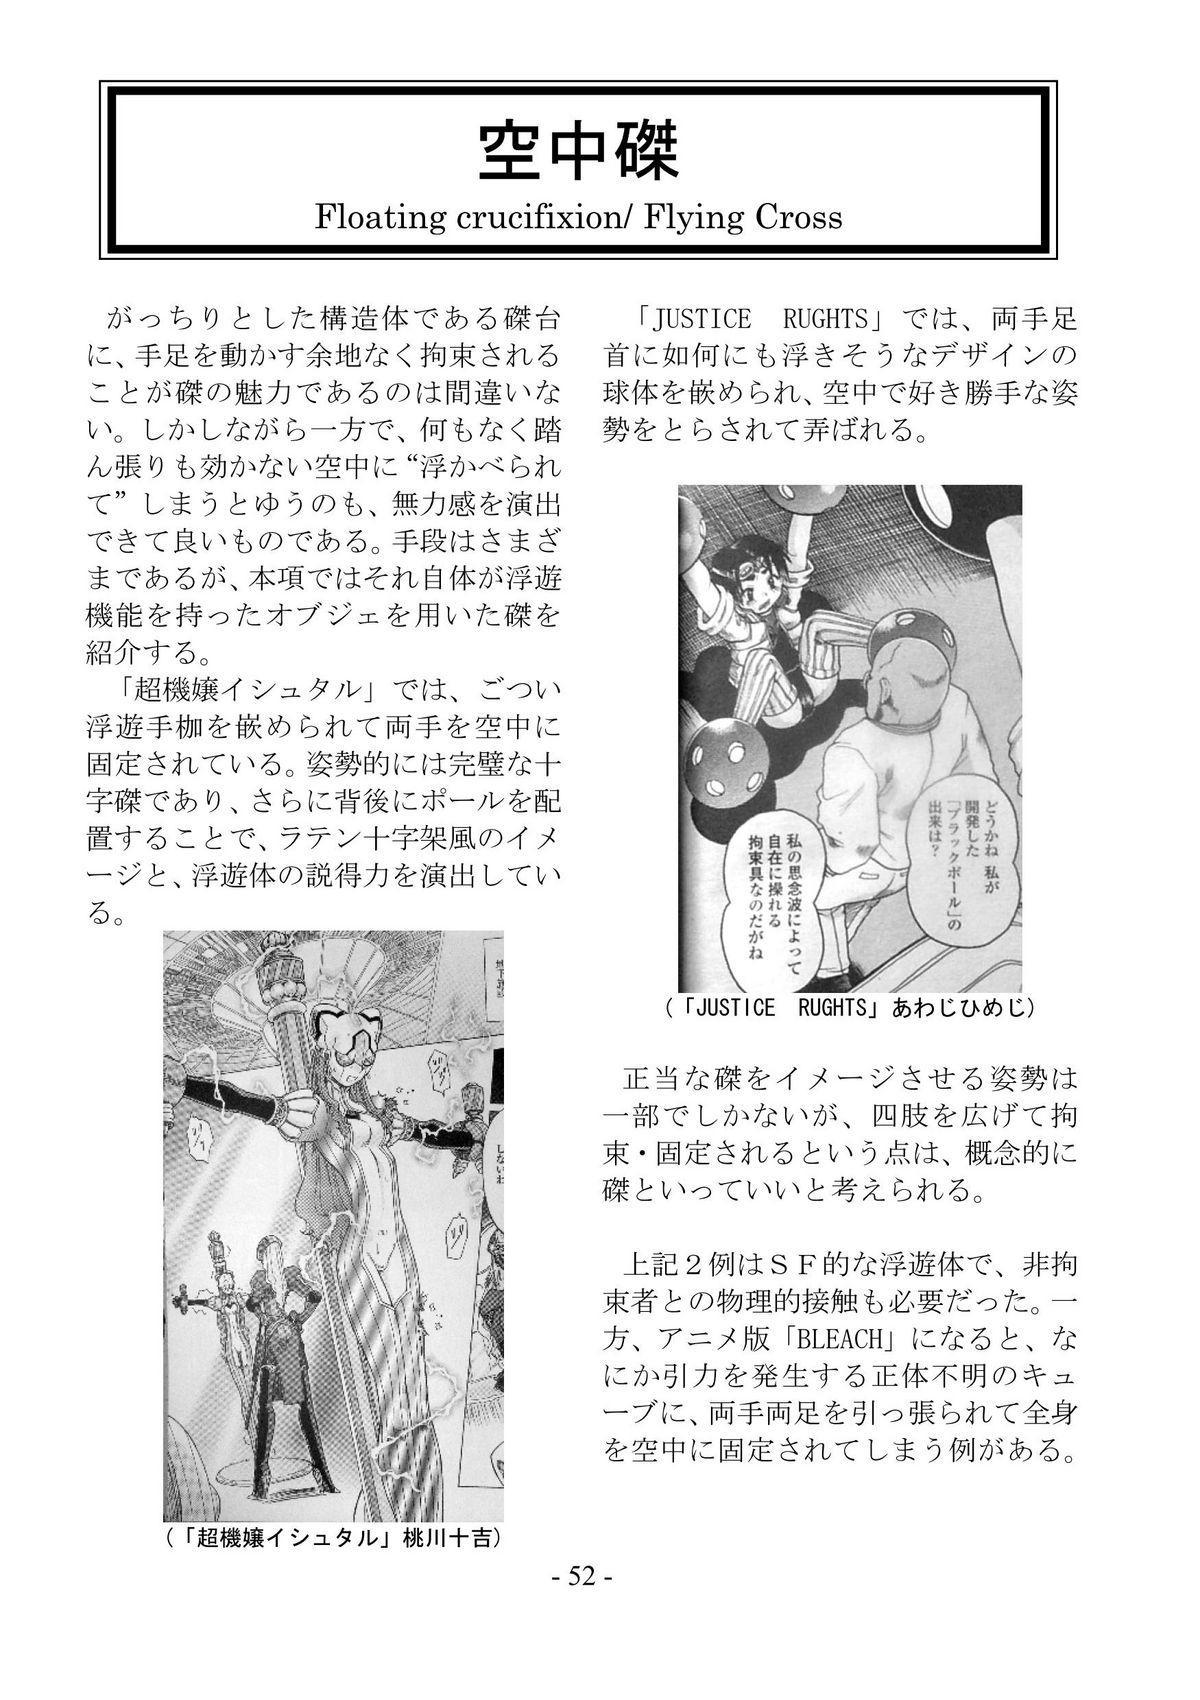 encyclopedia of crucifixion 52